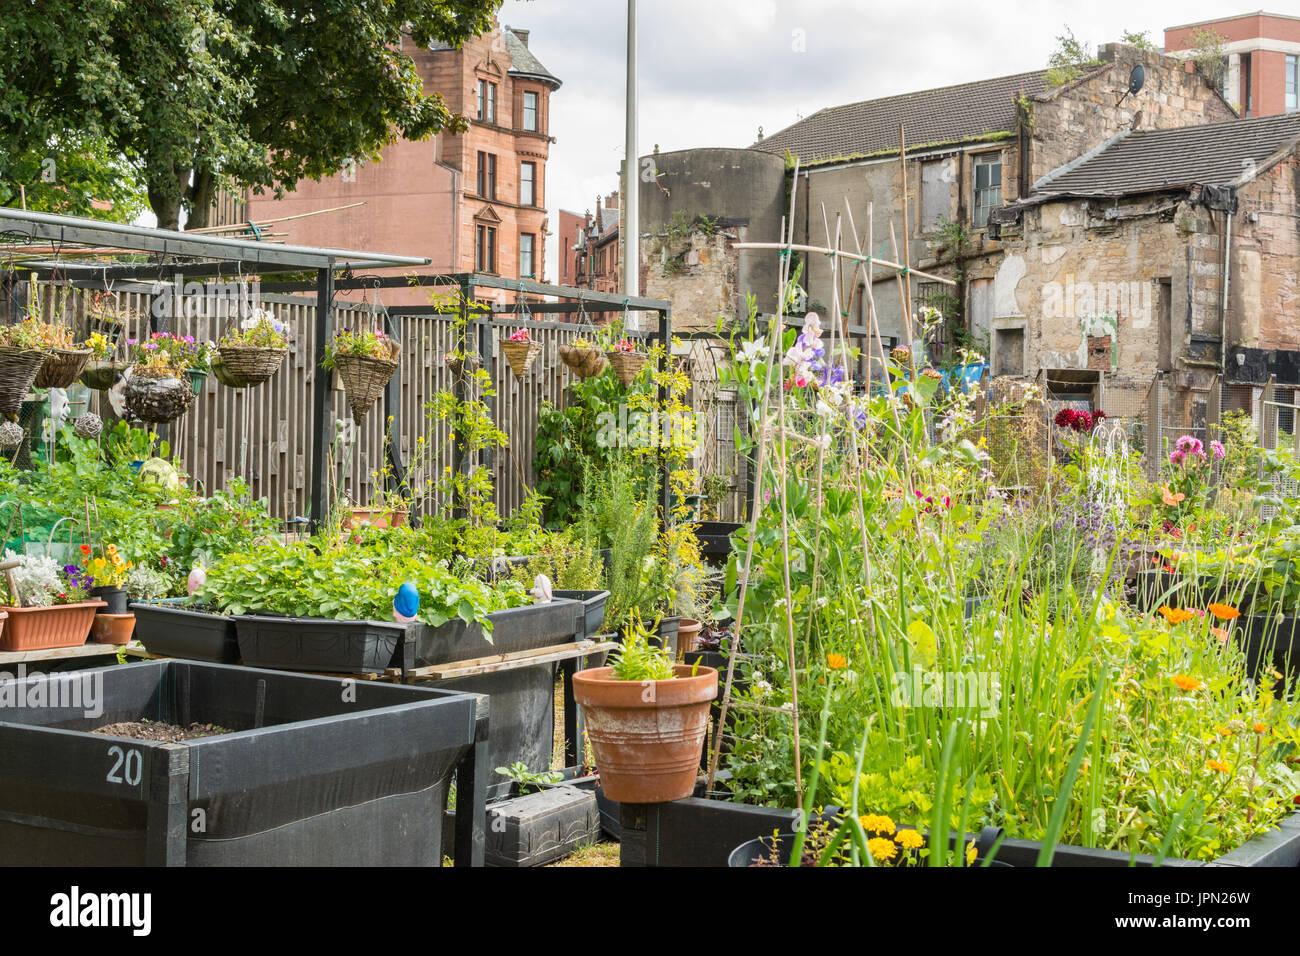 Greyfriars Garden a Stalled Spaces community garden, Merchant City area of Glasgow, Scotland,UK - Stock Image